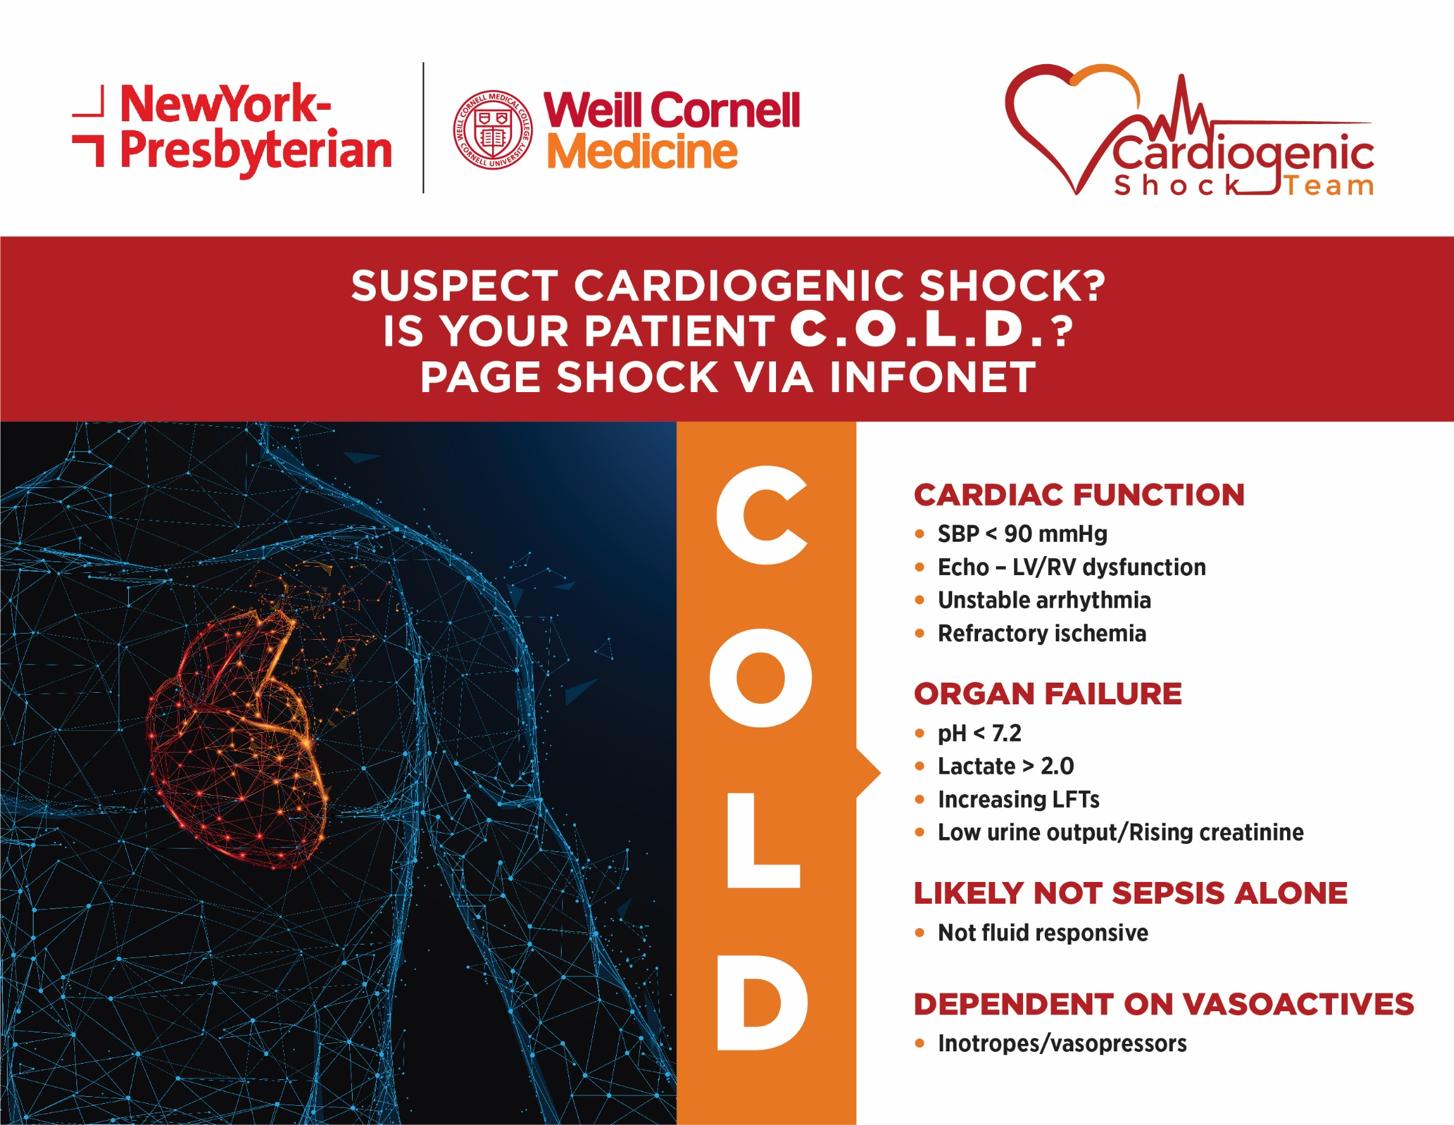 ecmo shock team, cardiothoracic surgery, cold criteria cornell